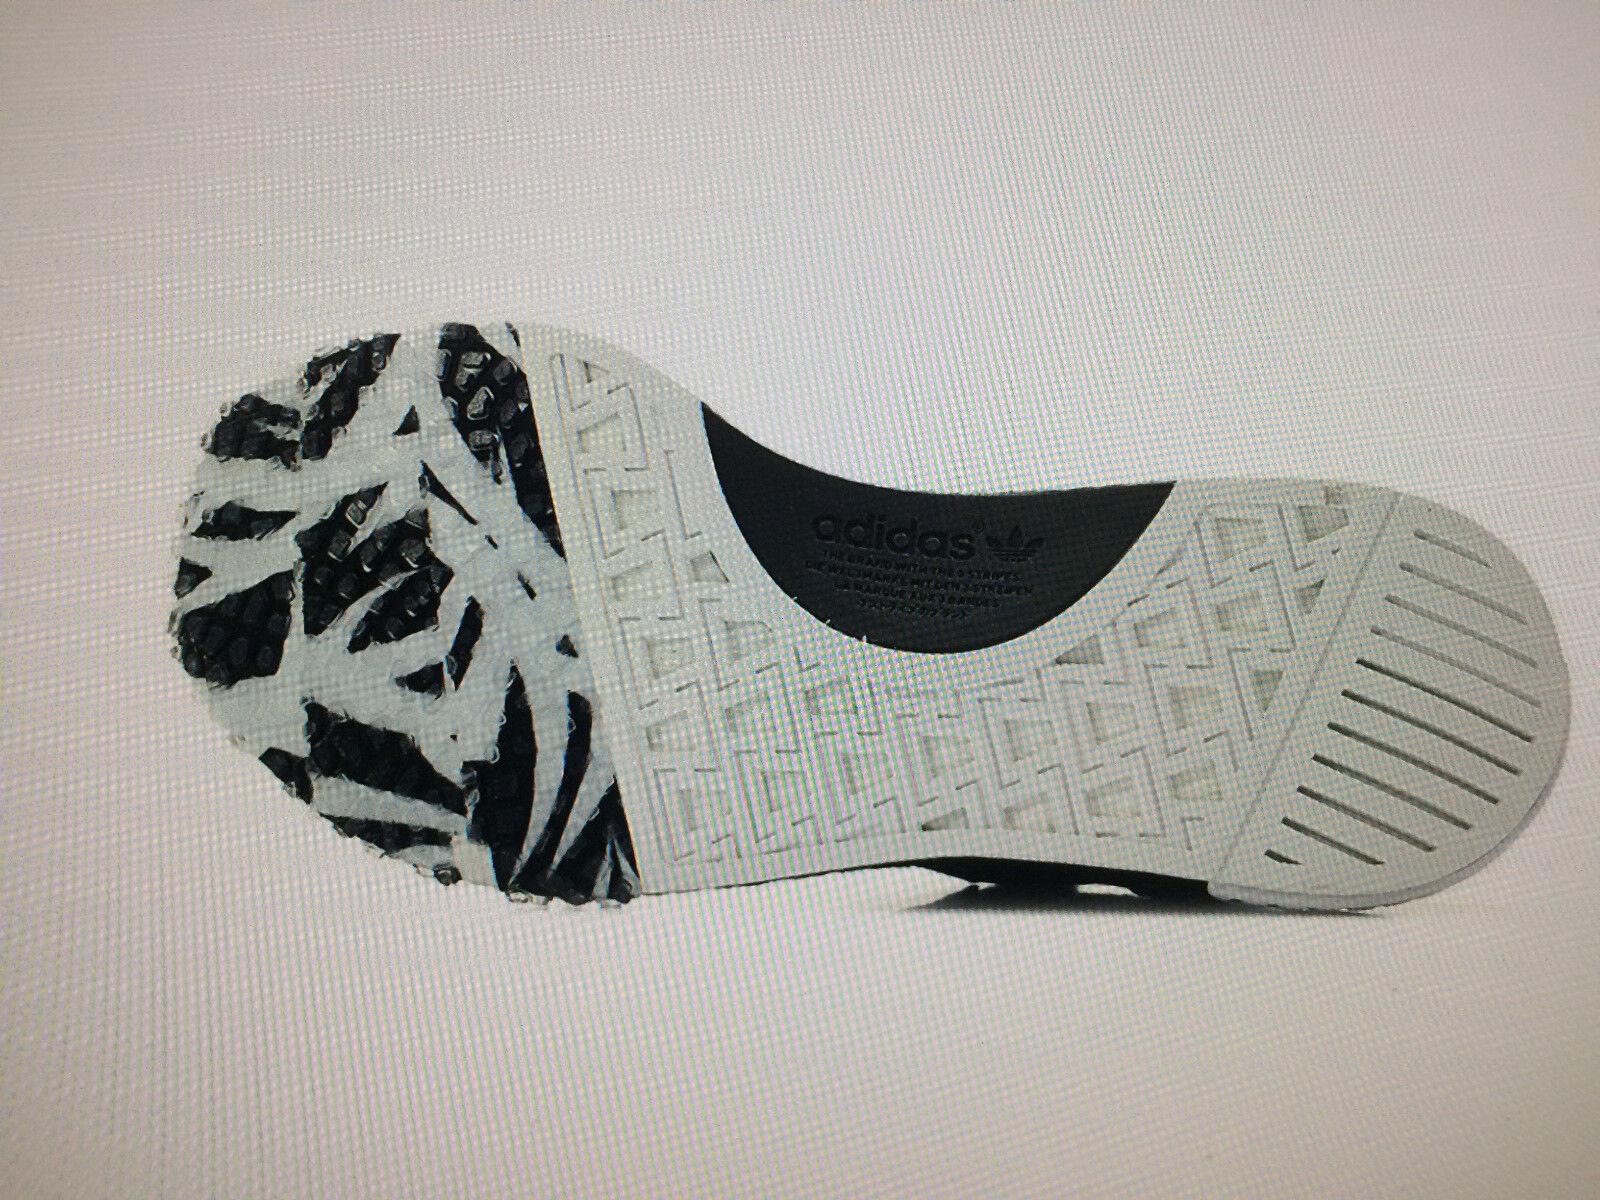 Adidas Consortium Consortium Consortium x Juice NMD Racer Boost (Noir /Argent  /Blanc )   9.5 US 9b2803